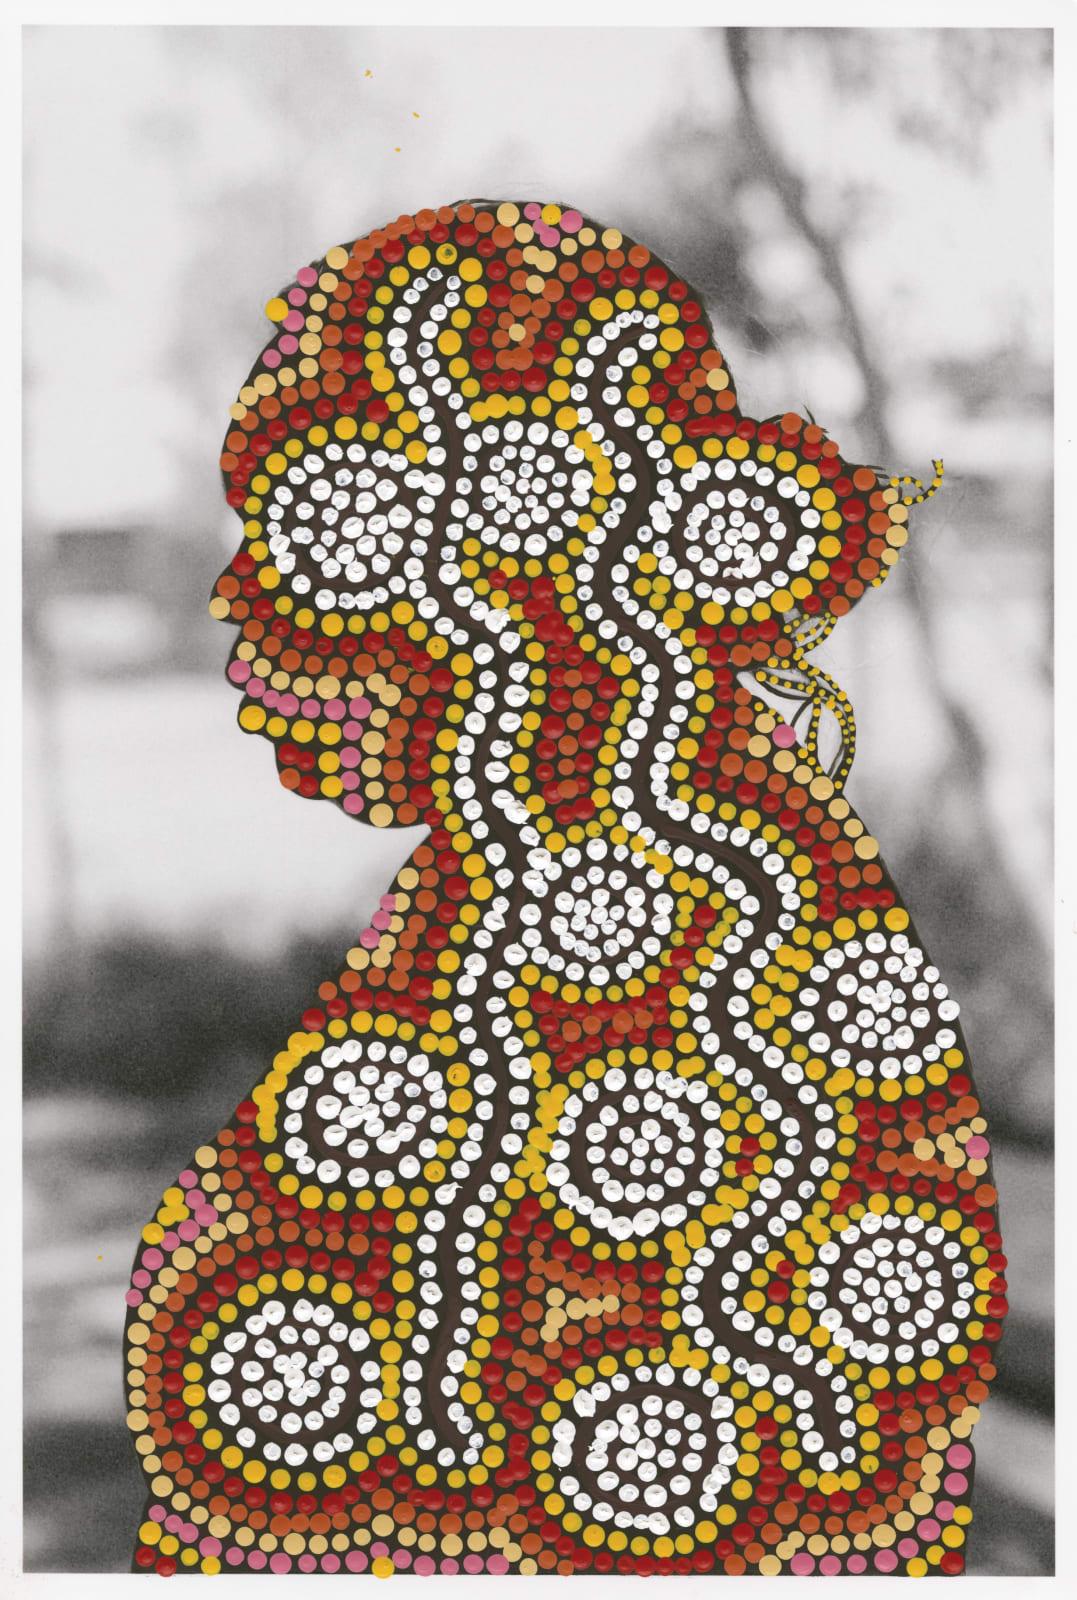 Patrick Waterhouse, Side Portrait Left / Restricted with Nathania Nangala Granites, 2014 - 2018